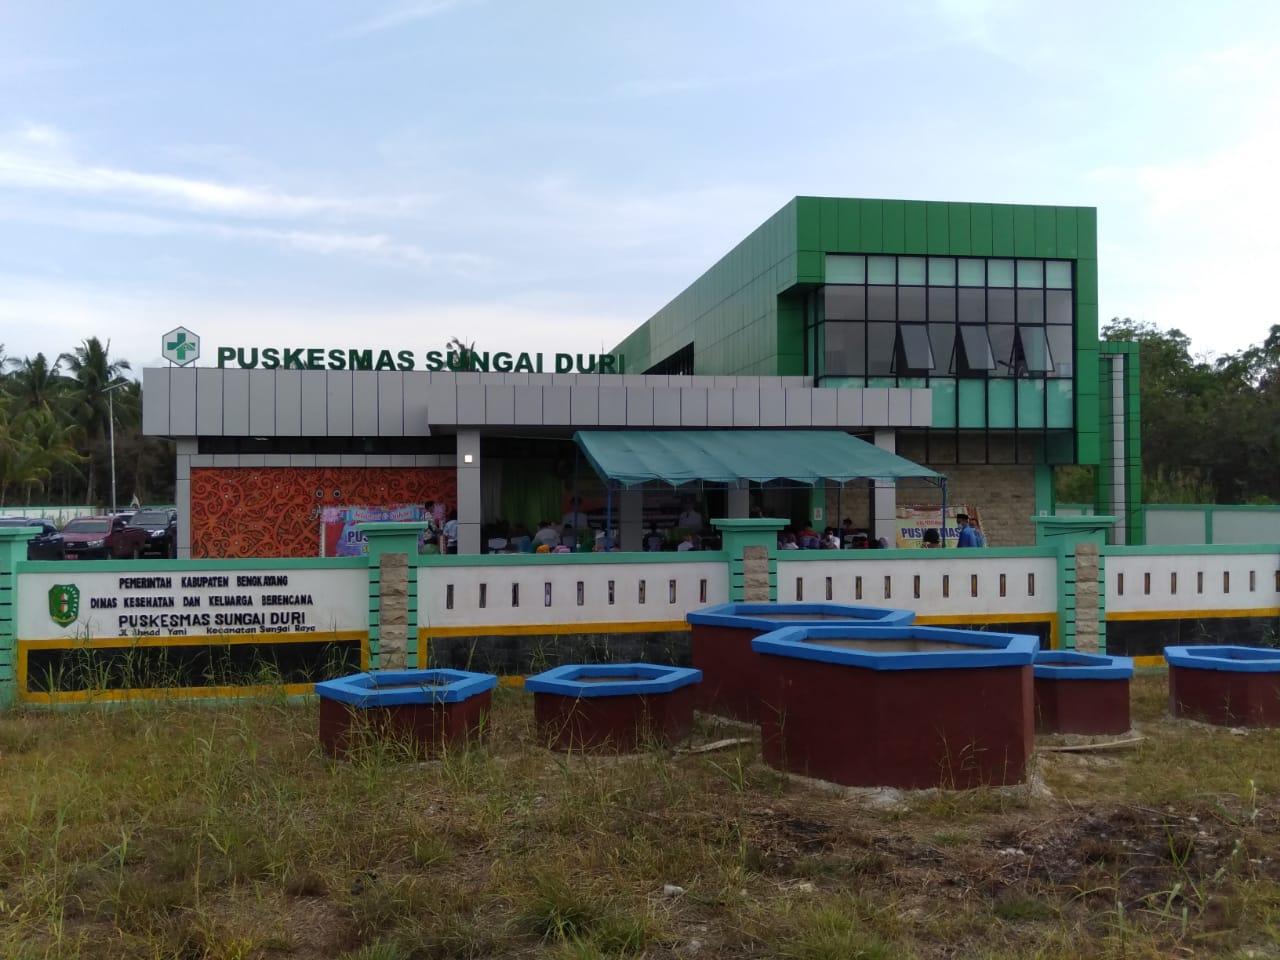 Darwis-Rizal Resmikan Gedung Baru Puskesmas Rawat Inap Sungai Duri